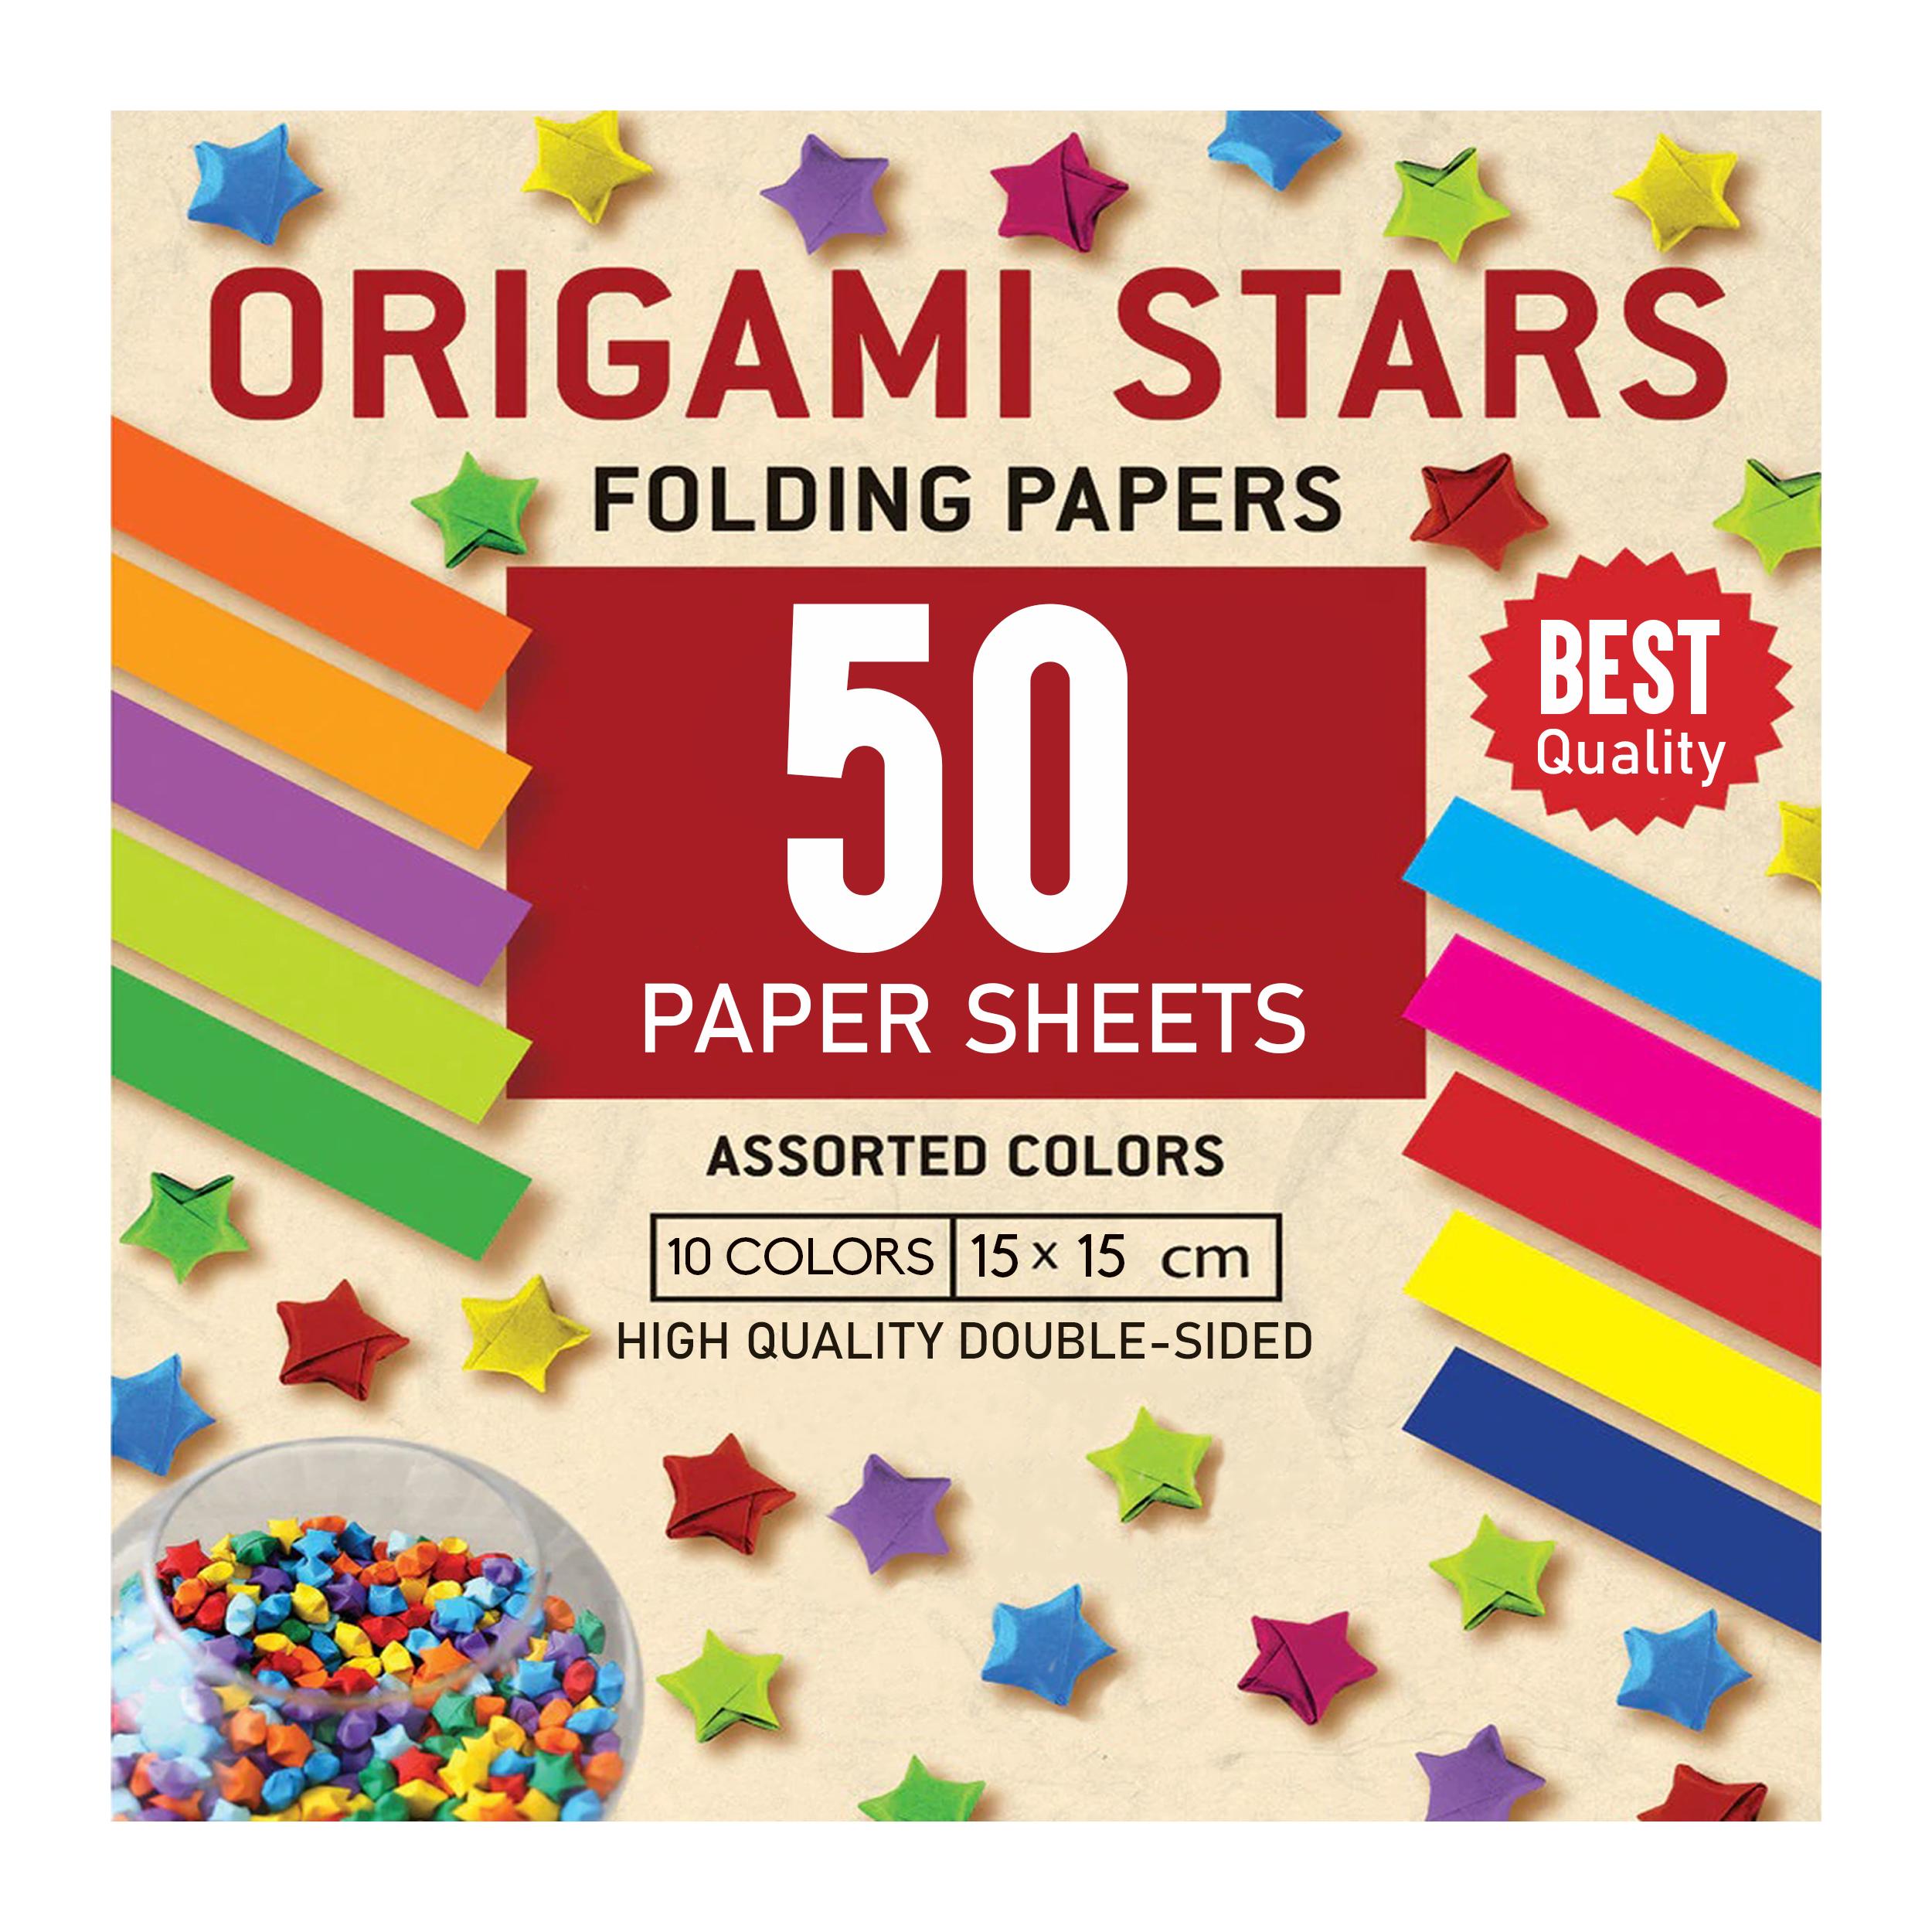 کاغذ اوریگامی استار کد 1515 بسته 50 عددی